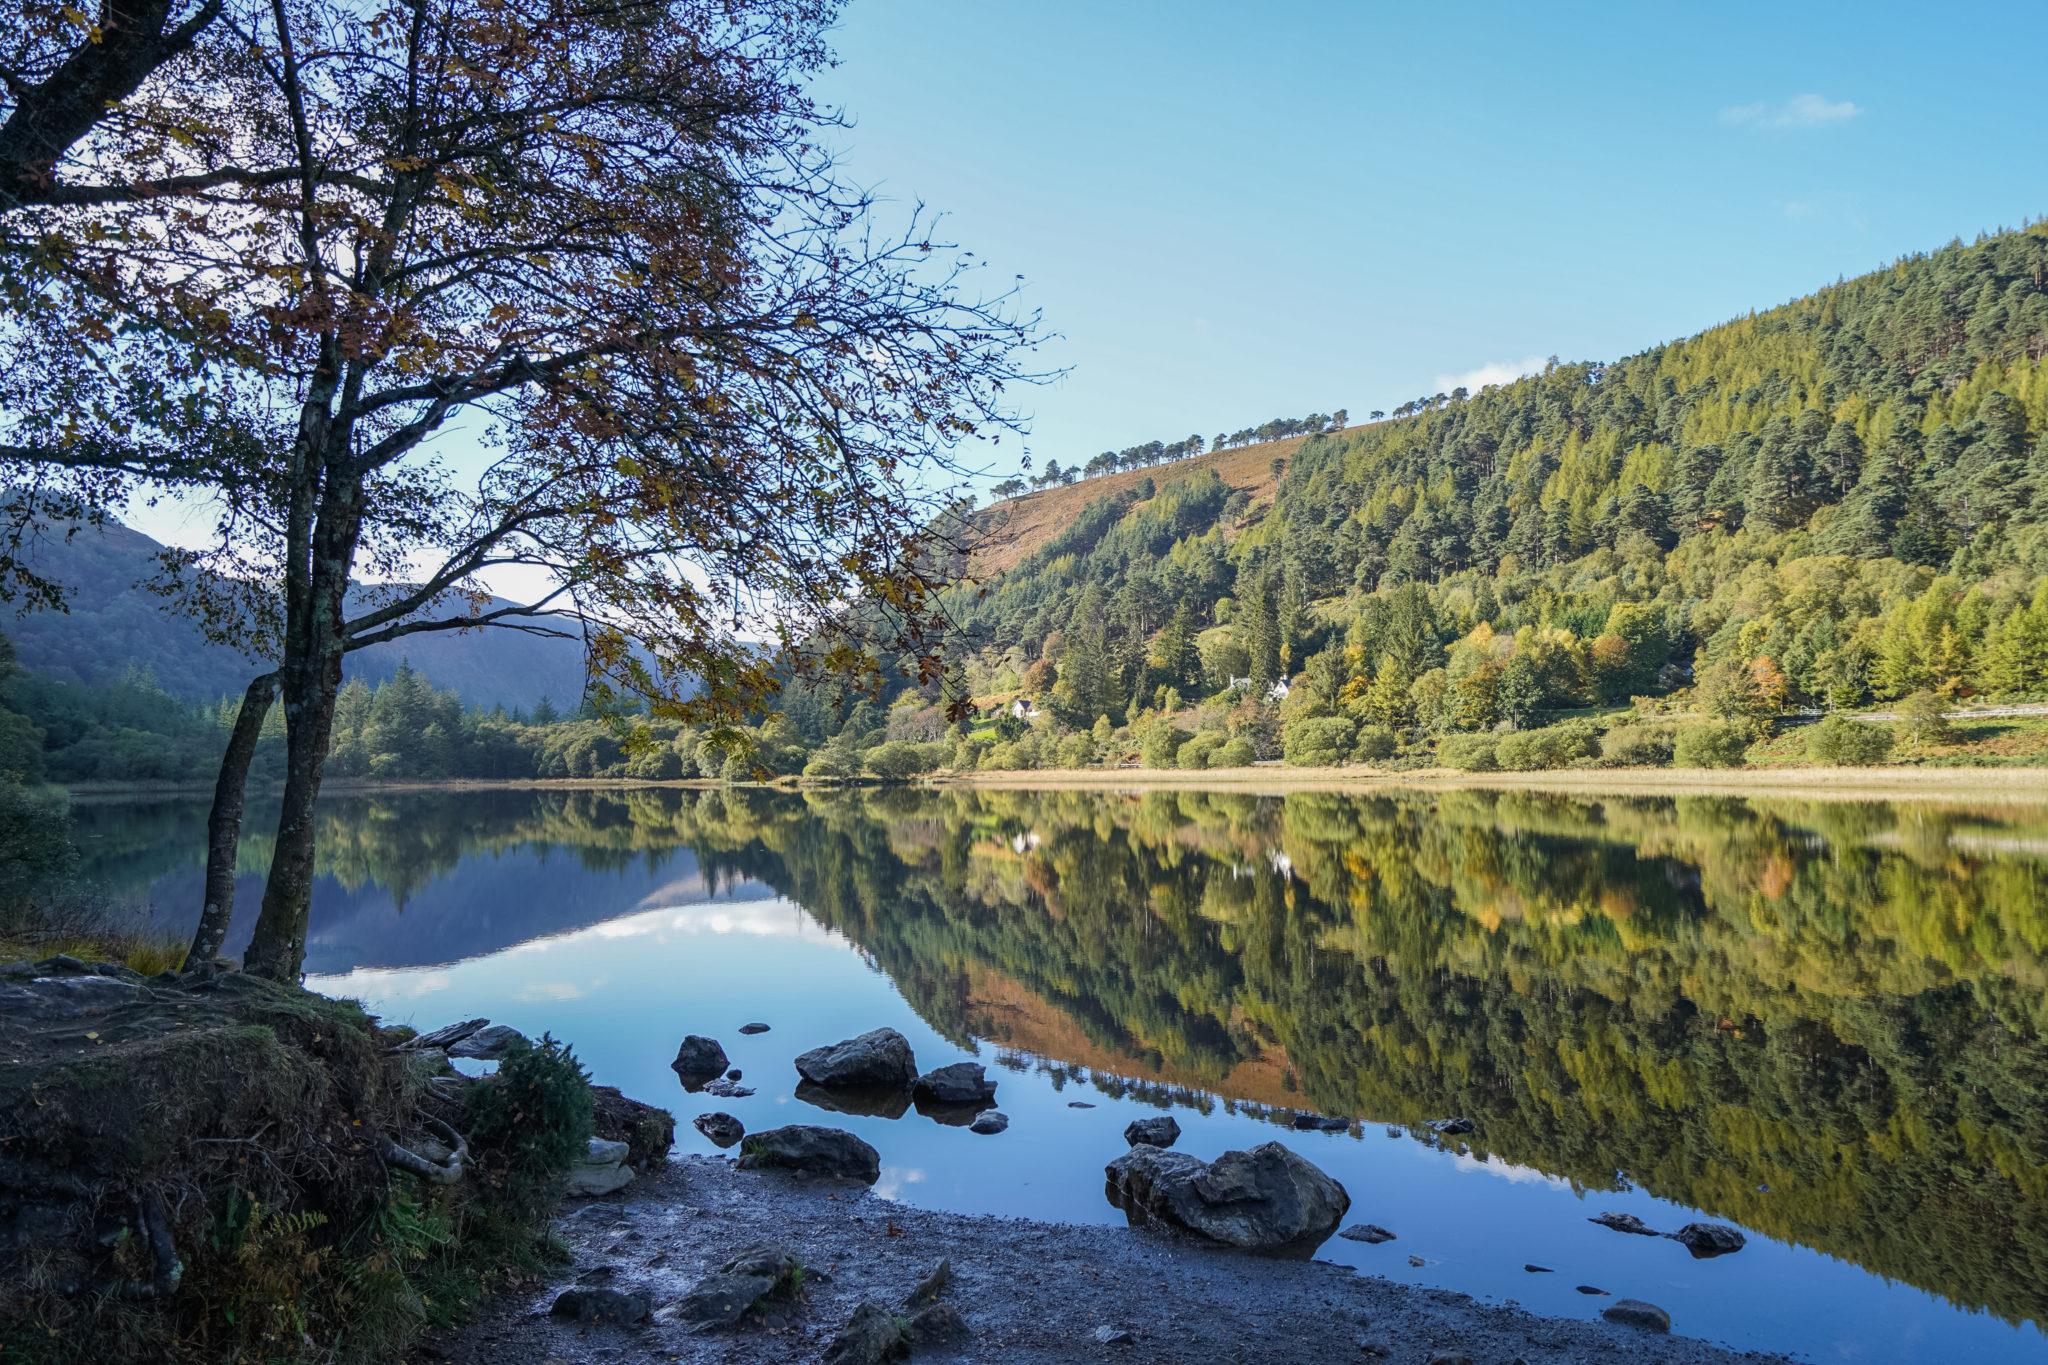 wicklow mountains-irlande-parc-dublin-outdoor-voyage